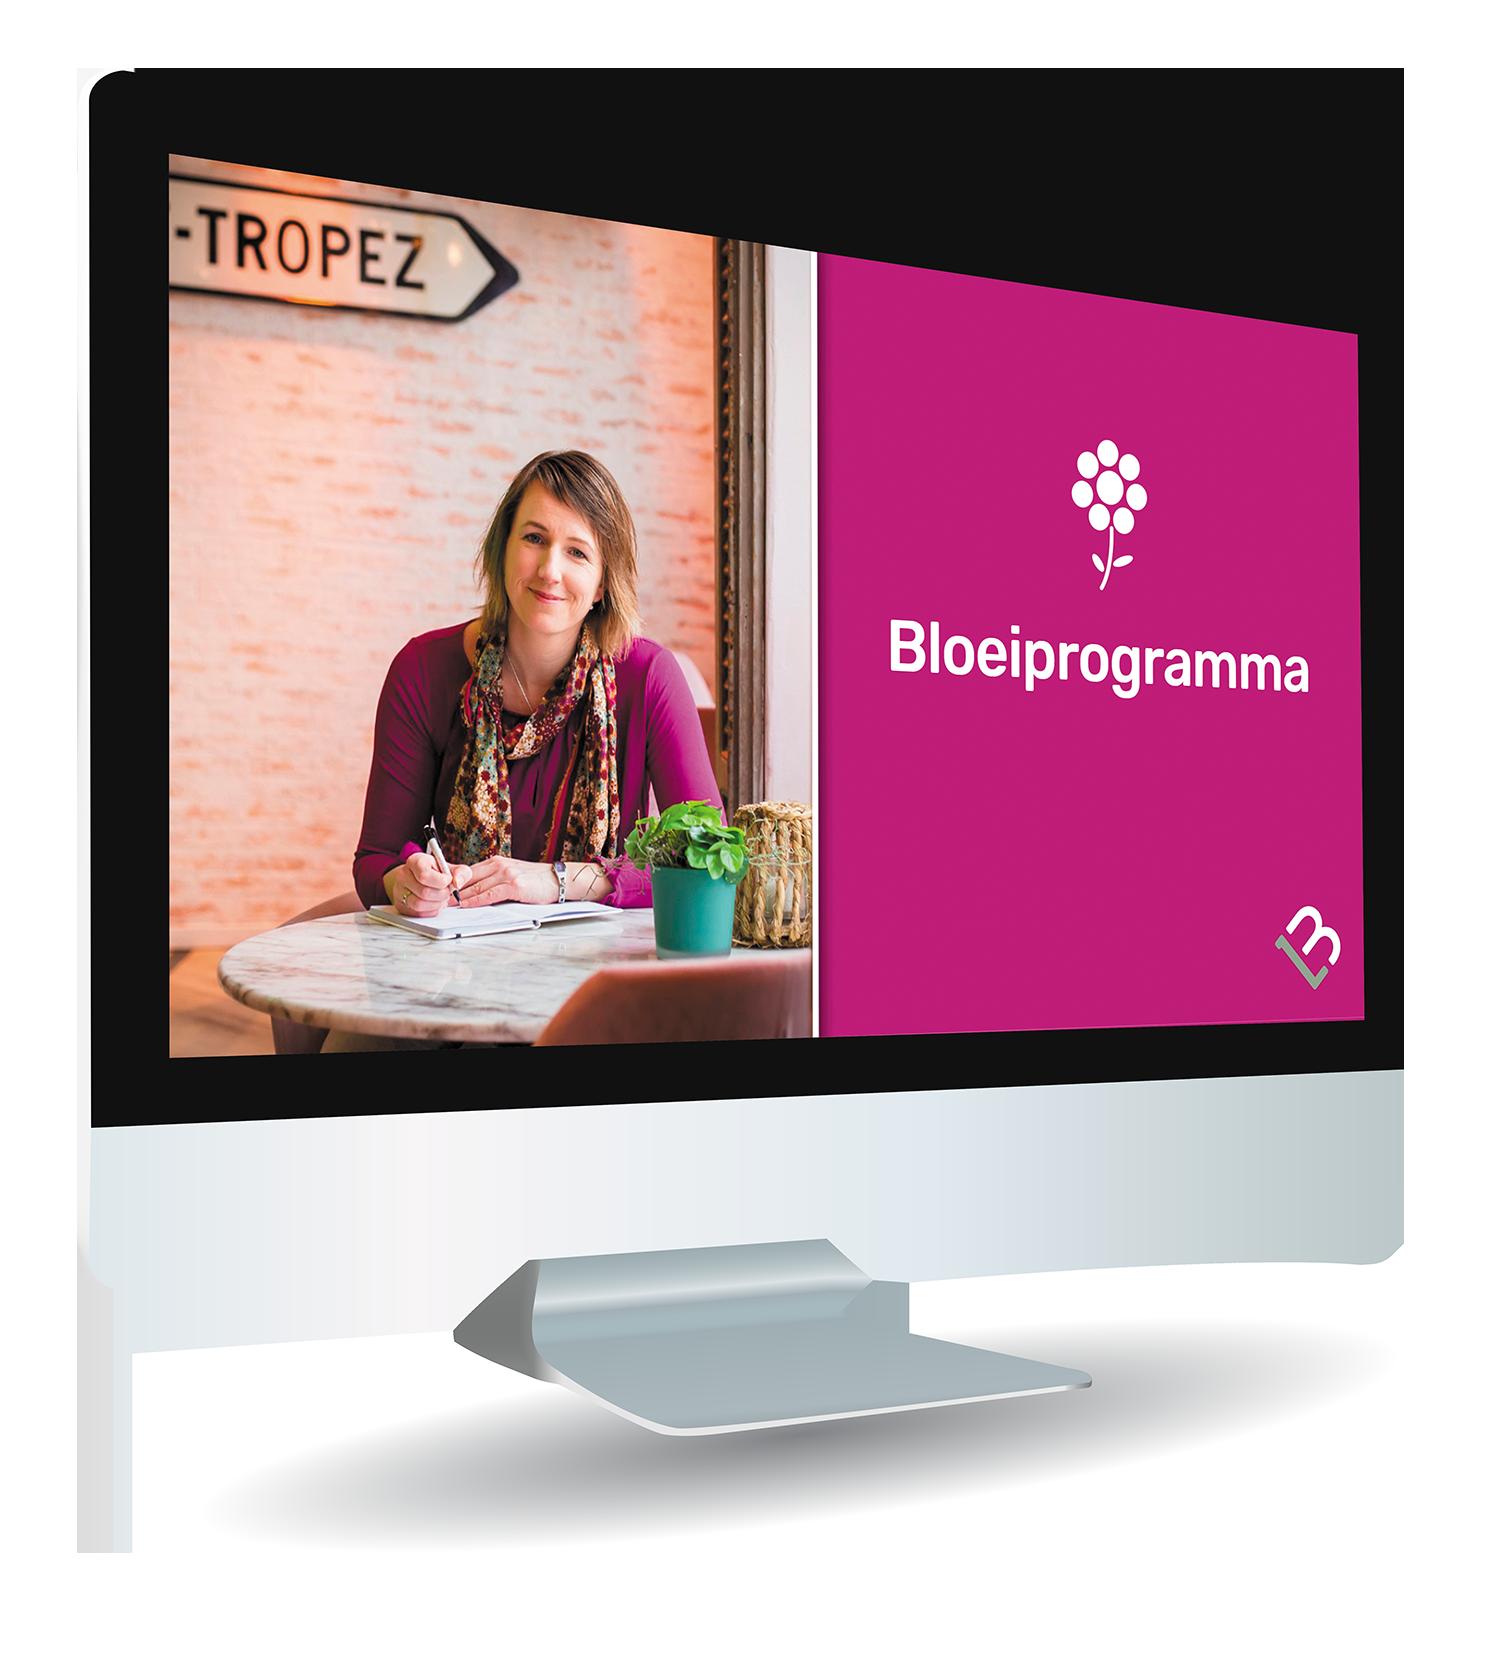 bloeiprogramma_mockup_desktop